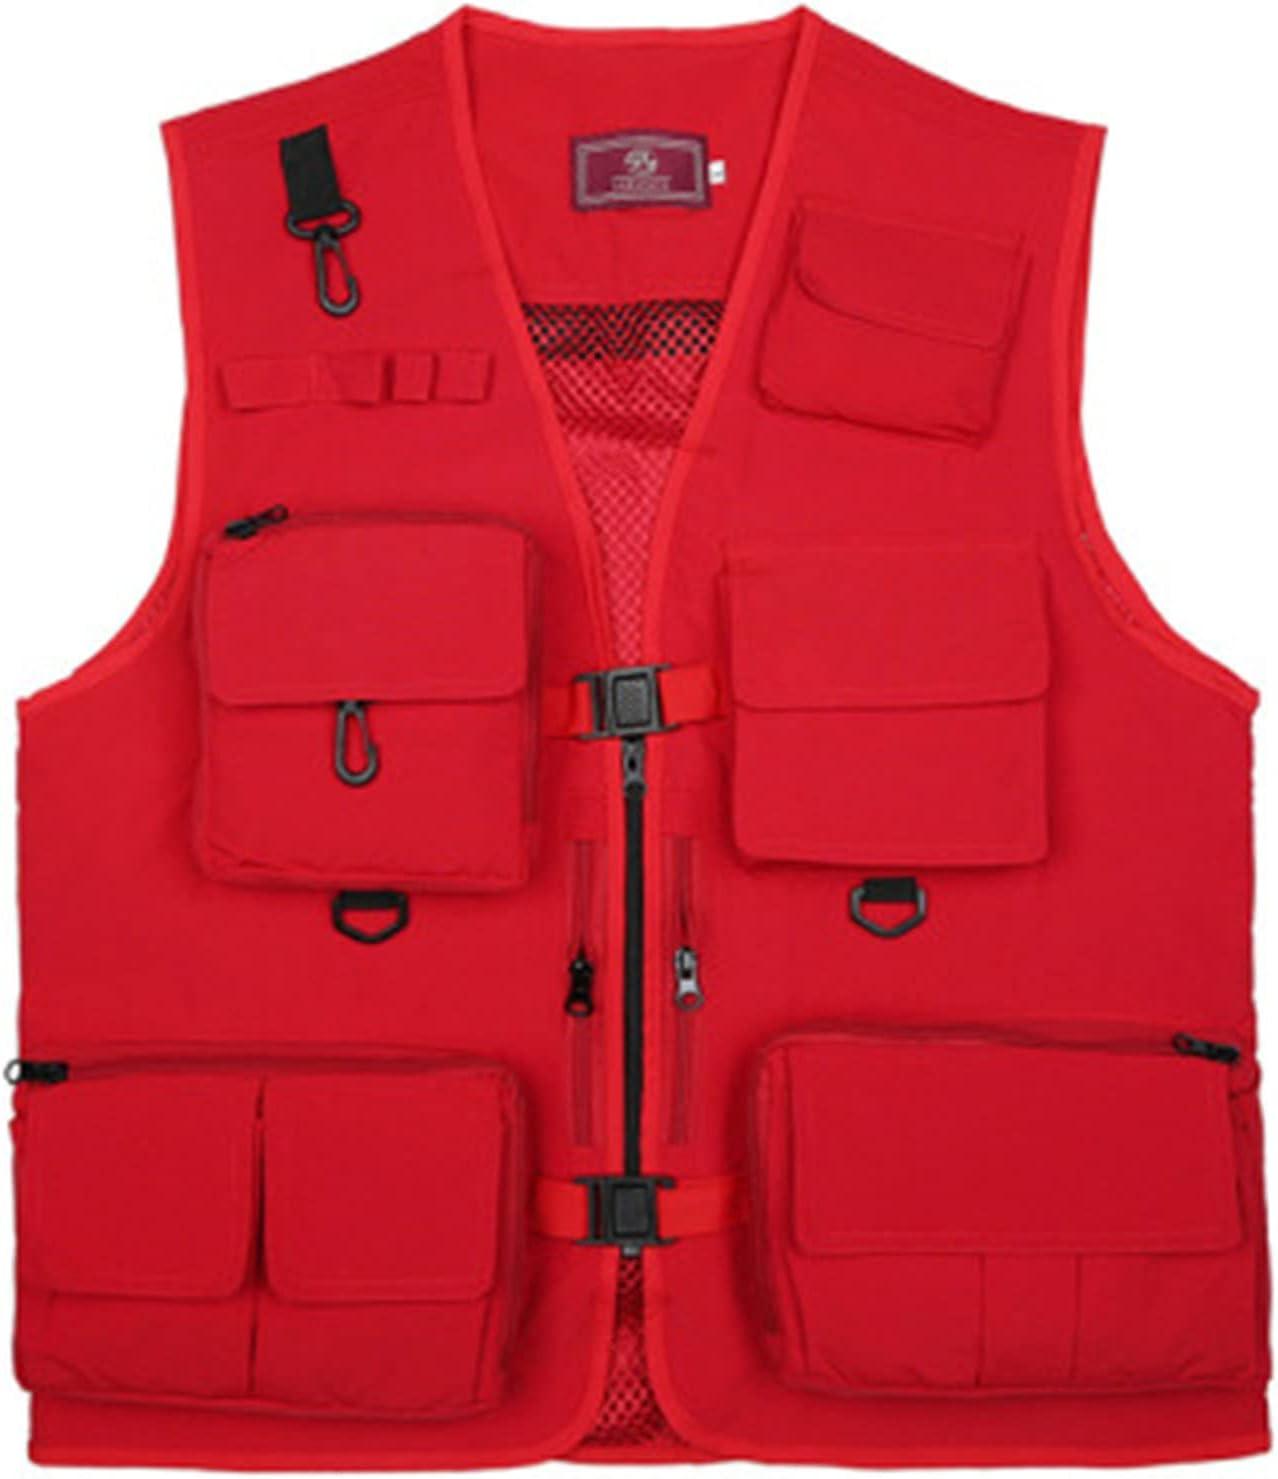 XIURAB Fishing Vest Quick-Drying Max 76% OFF shop Breatha Multifunctional